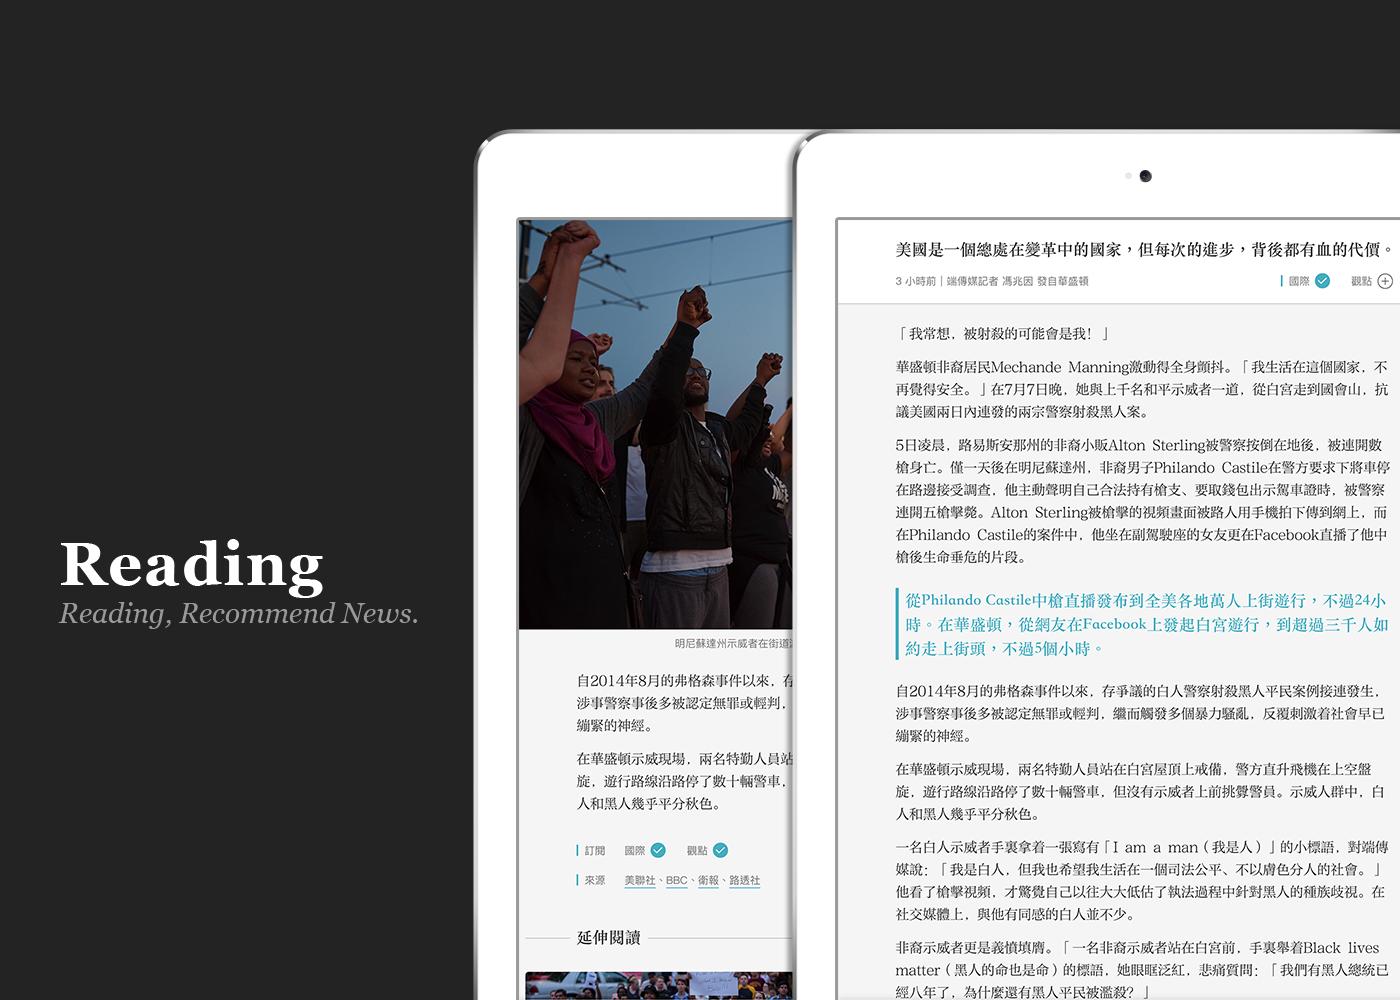 news iPad ios app journalism   newspaper media digital media chinese Reading